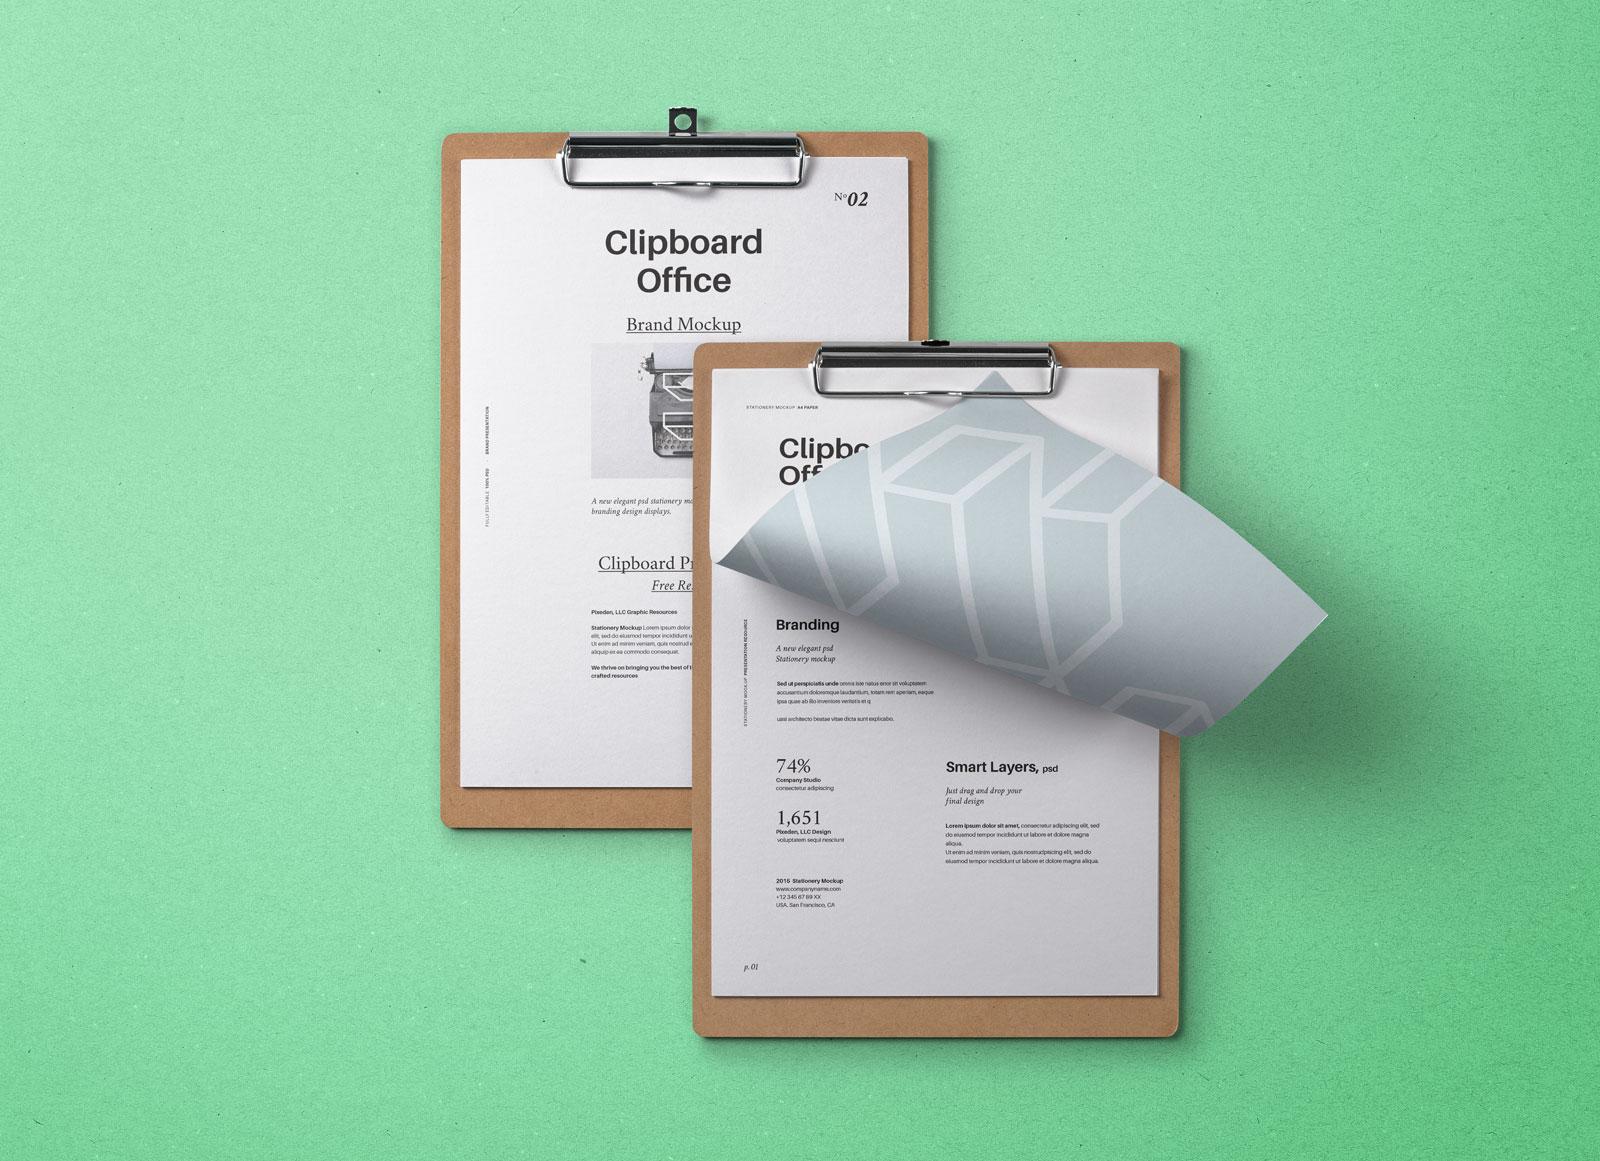 free paper clipboard a4 flyer mockup psd